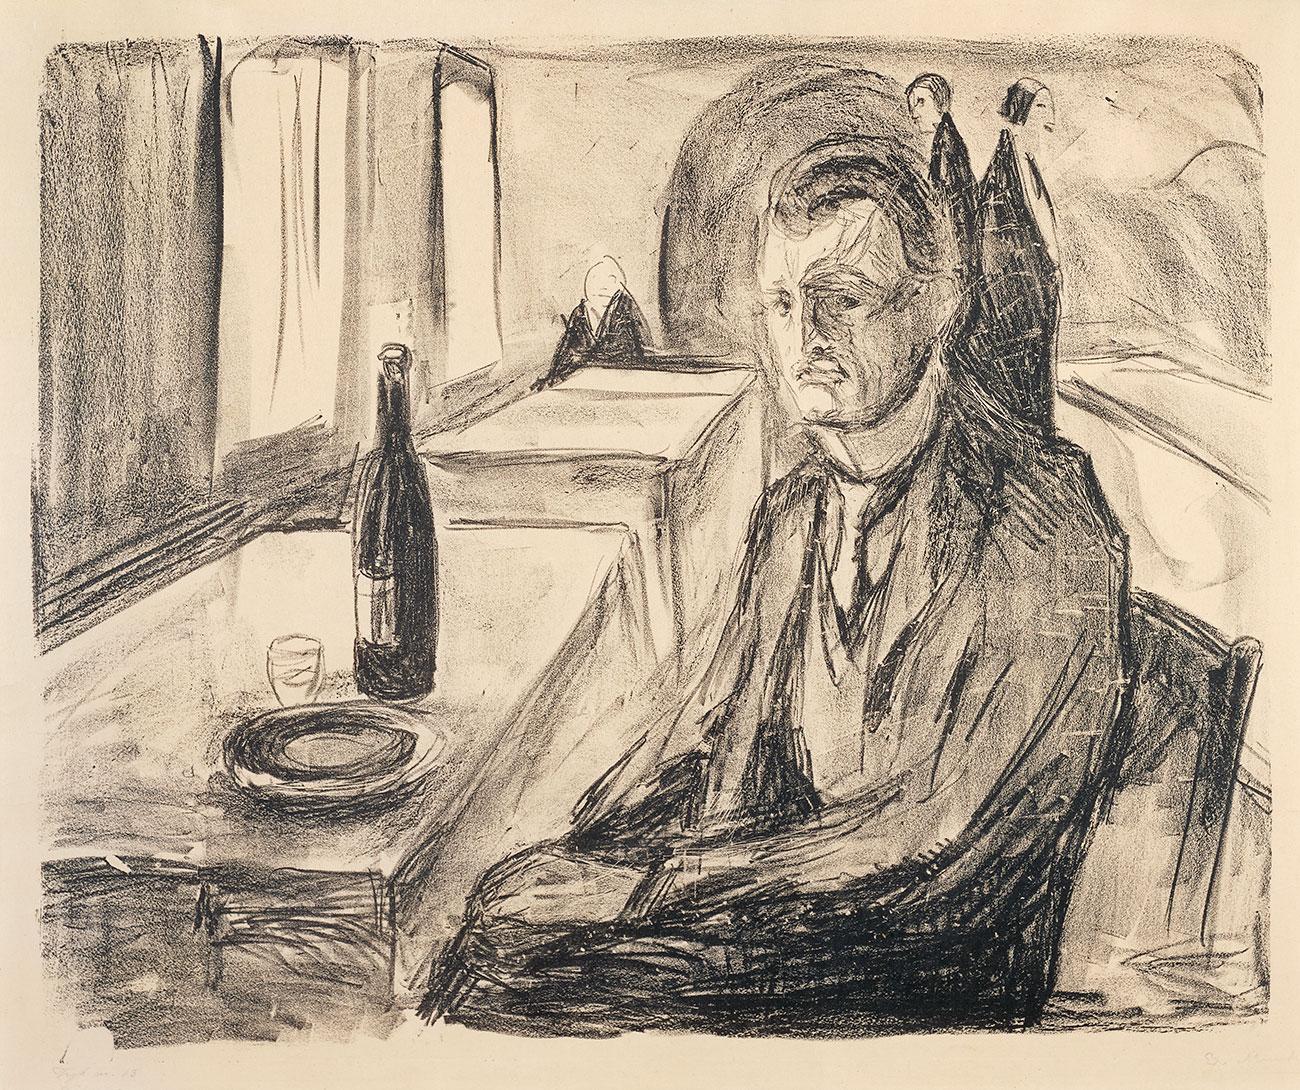 Edvard-Munch-84-Self-Portrait-with-Bottle-of-Winejpg